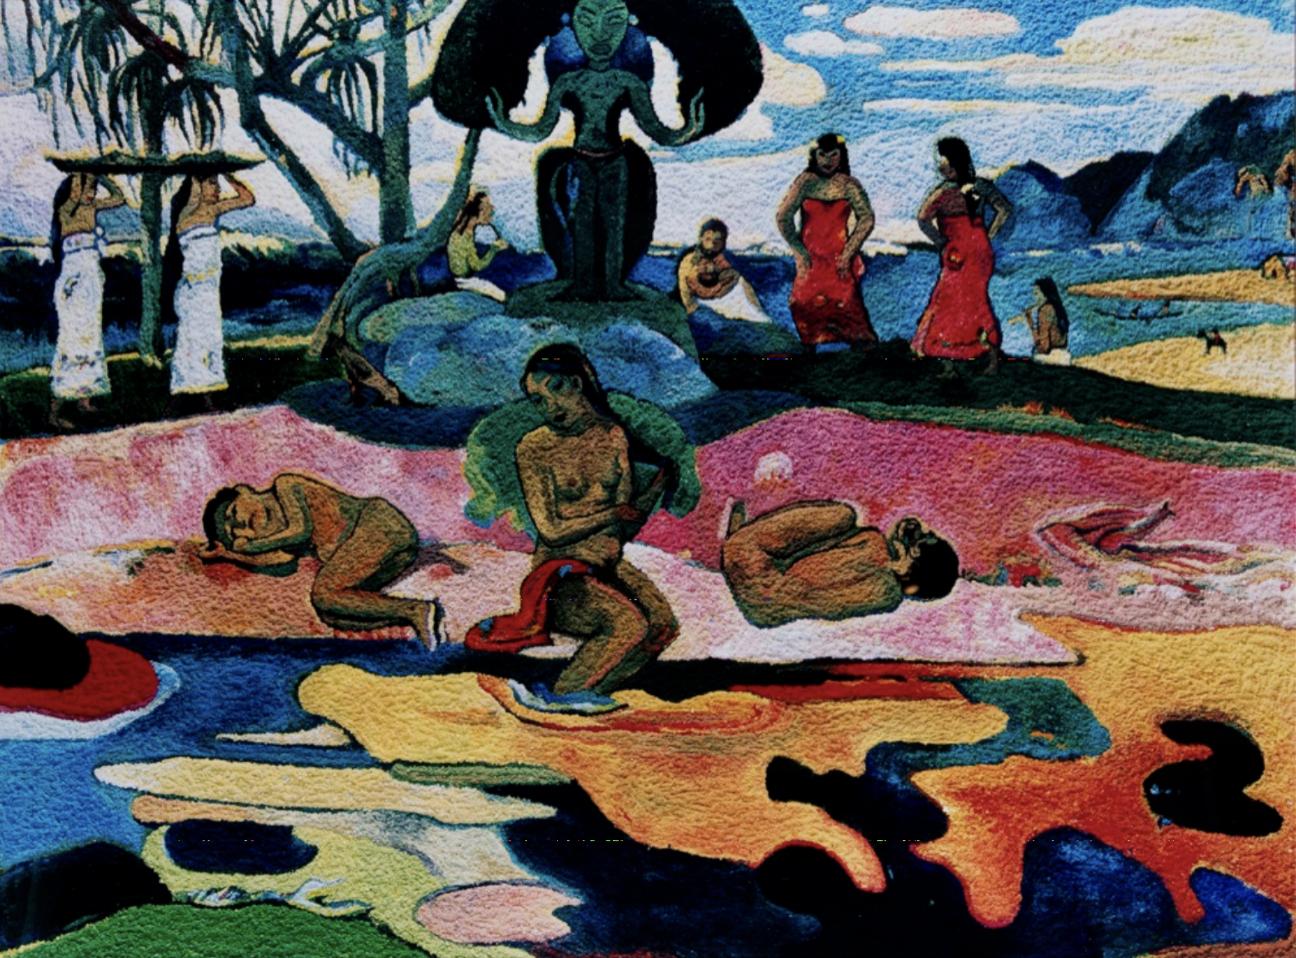 Mahana No Atua (Day of the Gods), After Gauguin by Vik Muniz